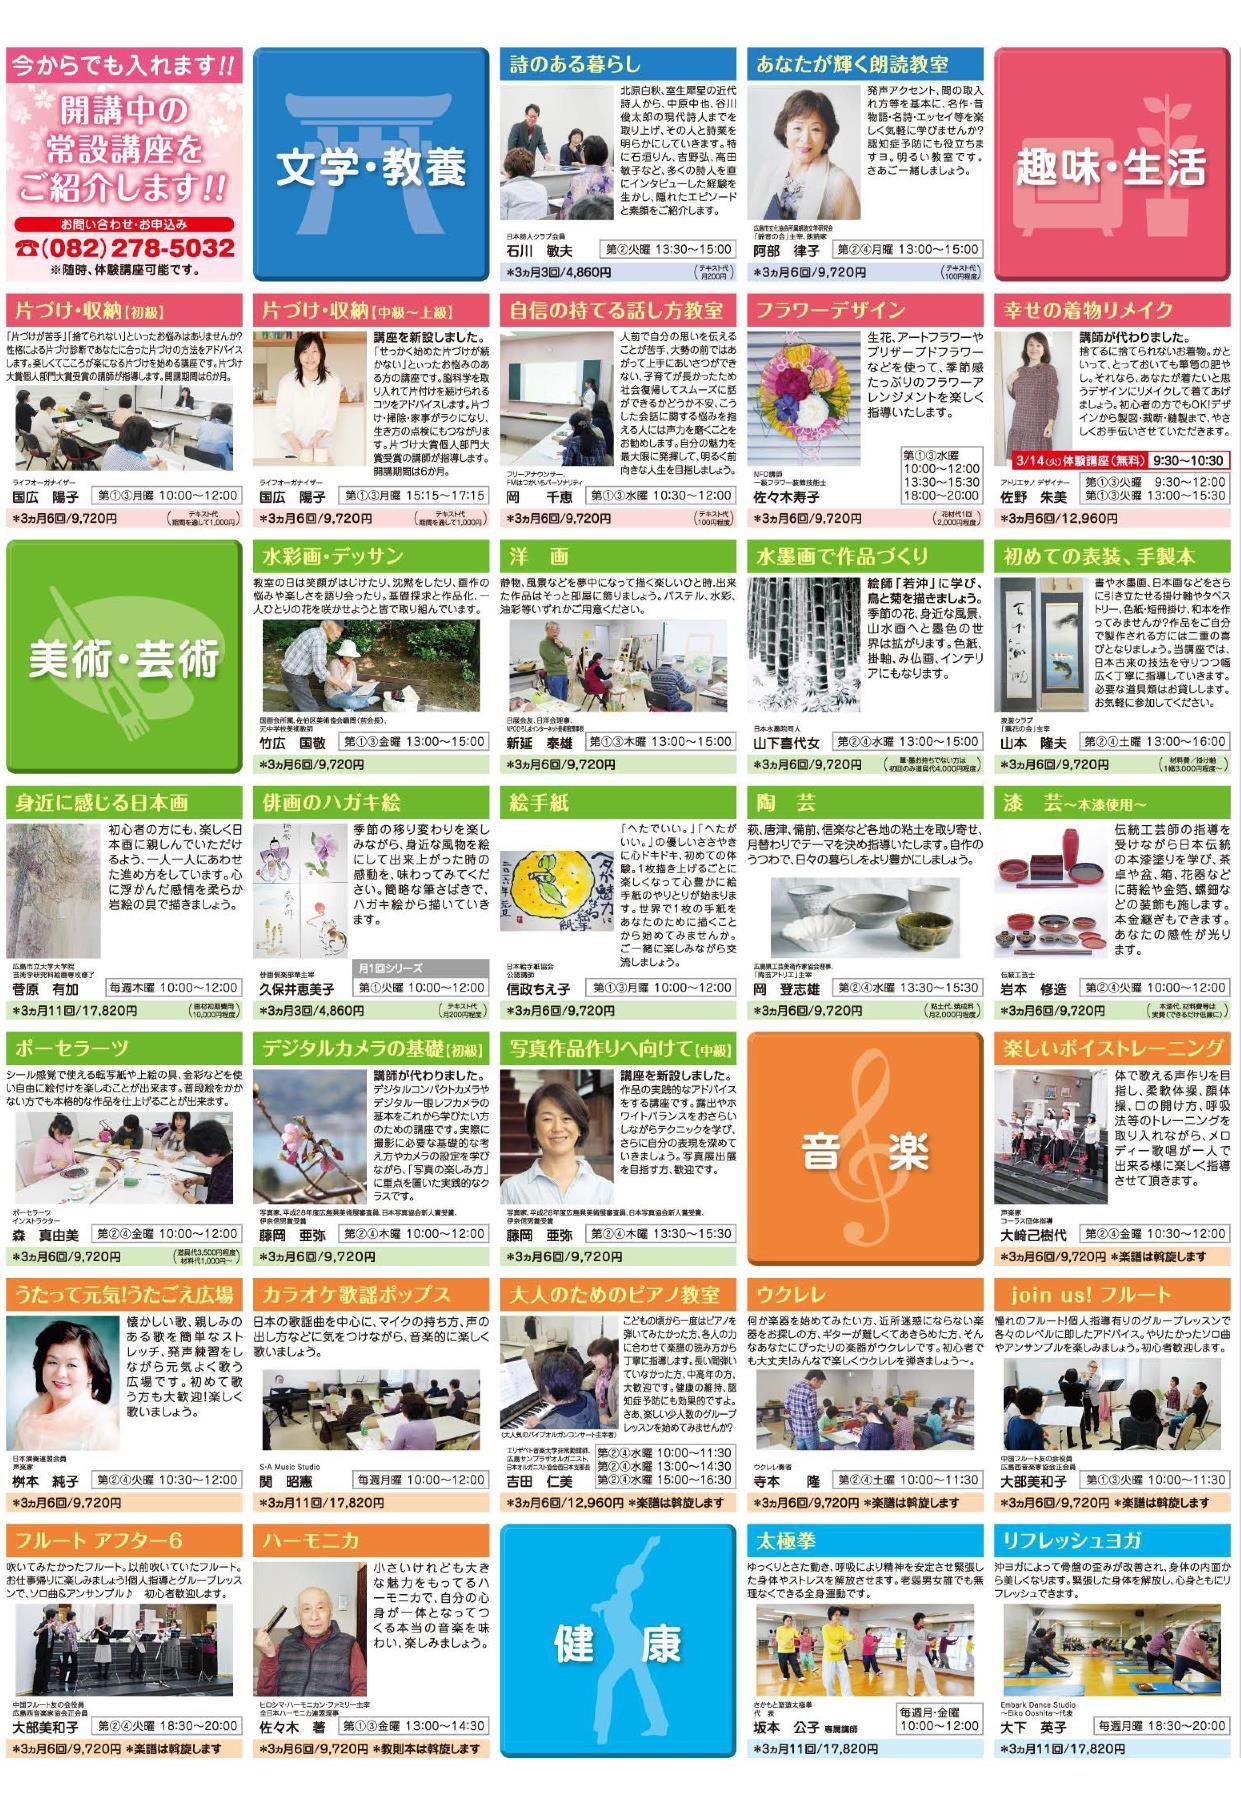 http://hiroshima-sunplaza.or.jp/blog/%E5%B9%B3%E6%88%9029%E5%B9%B4%E5%BA%A61%E6%9C%9F_2web.jpg